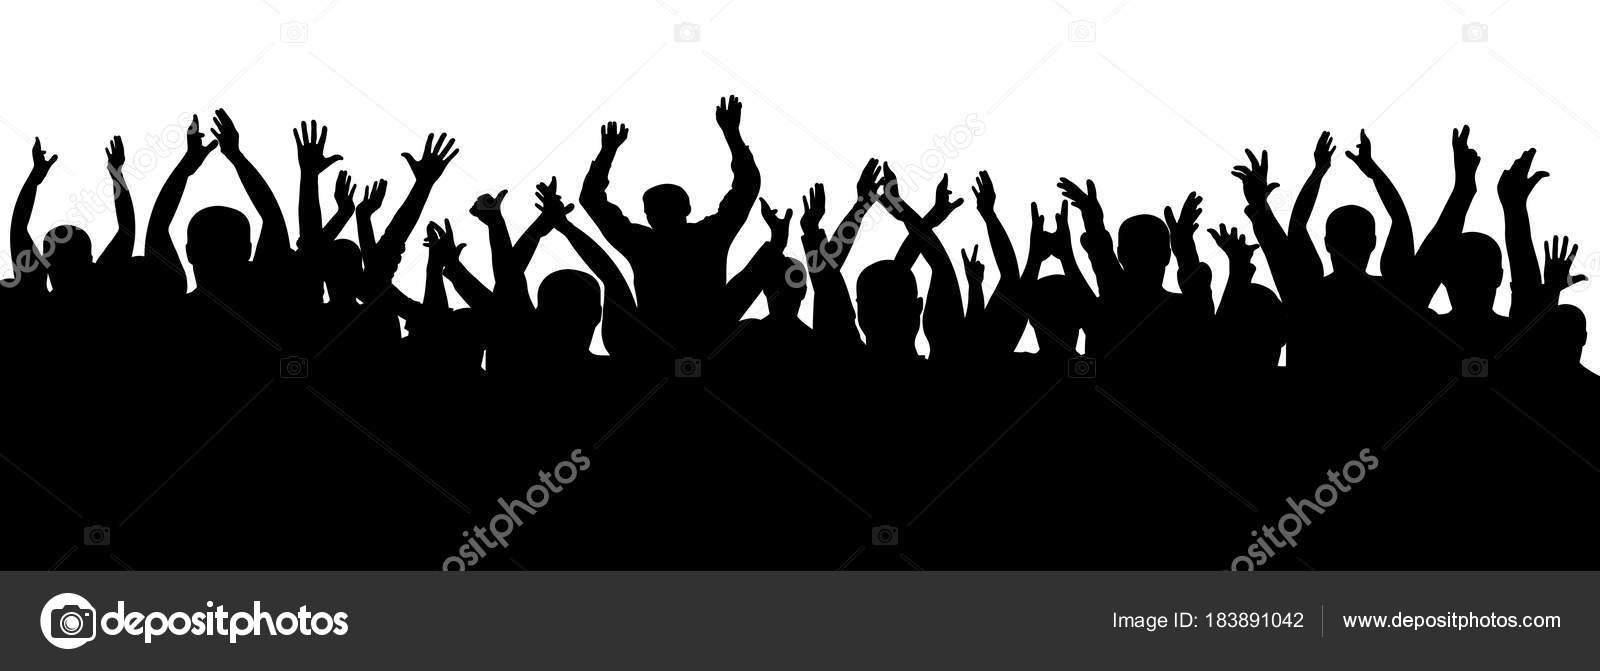 Multitud De Gente Silueta